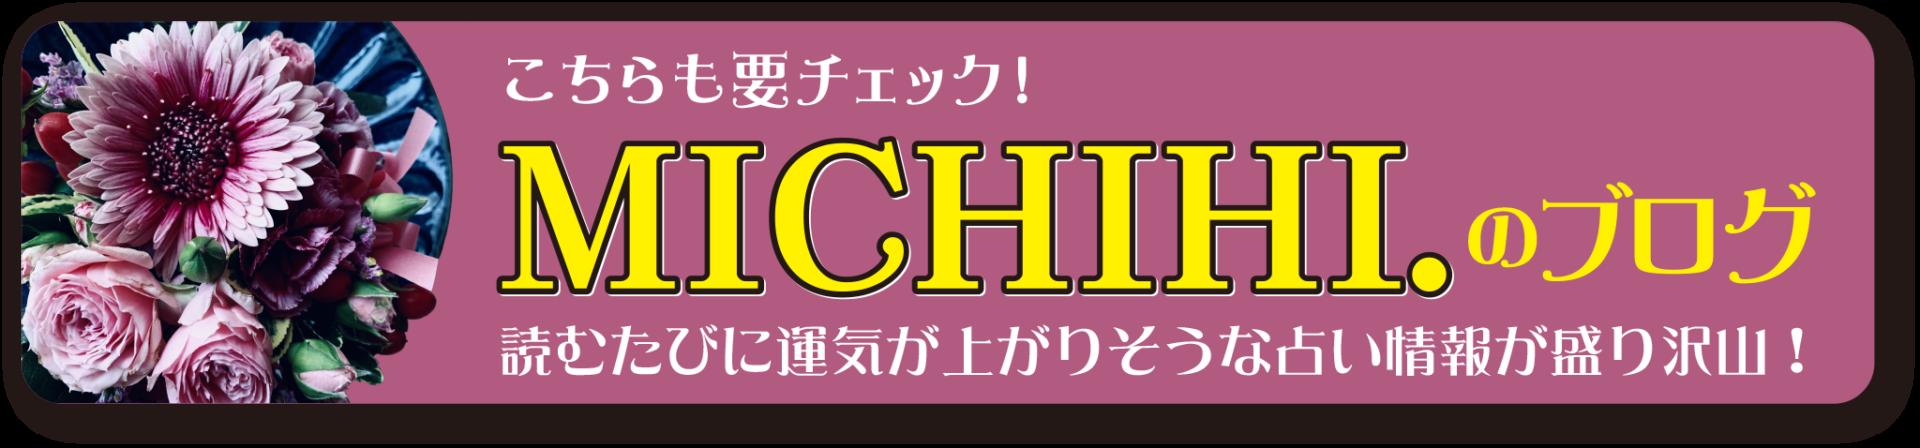 MICHIHI占いブログ